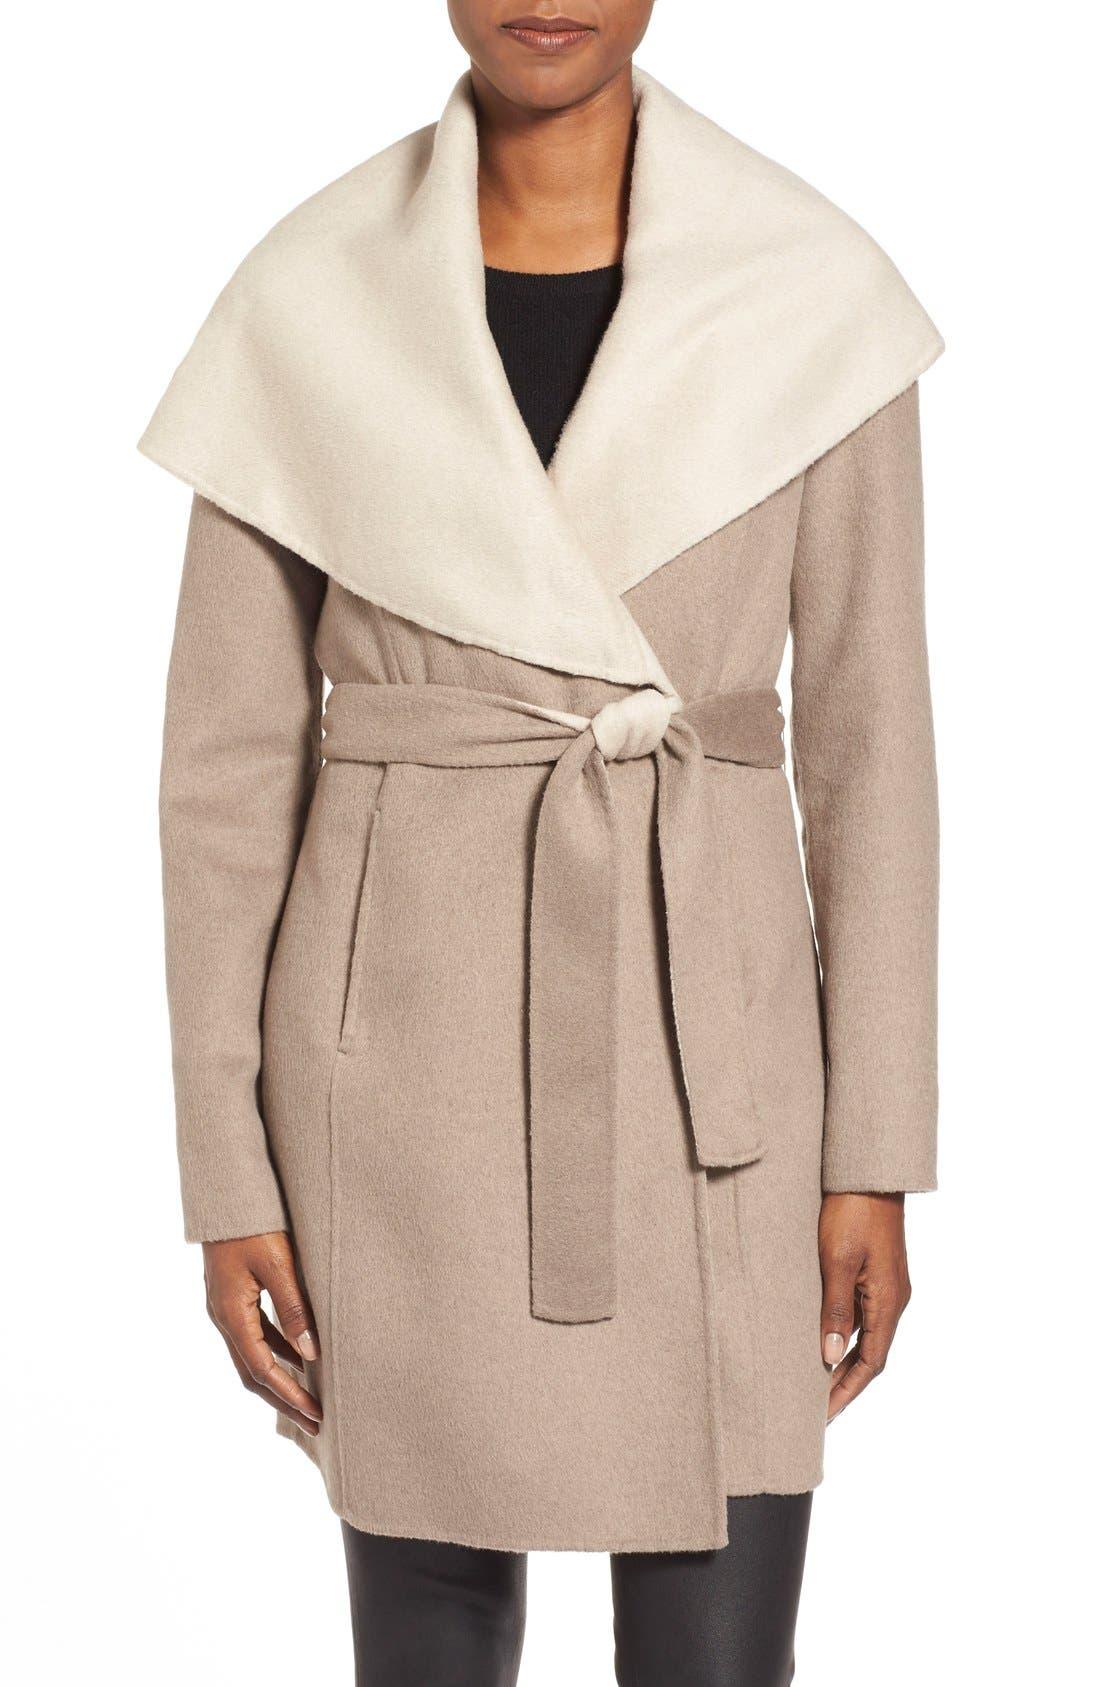 Main Image - ElieTahari'Mala' Hooded Wool BlendWrap Coat